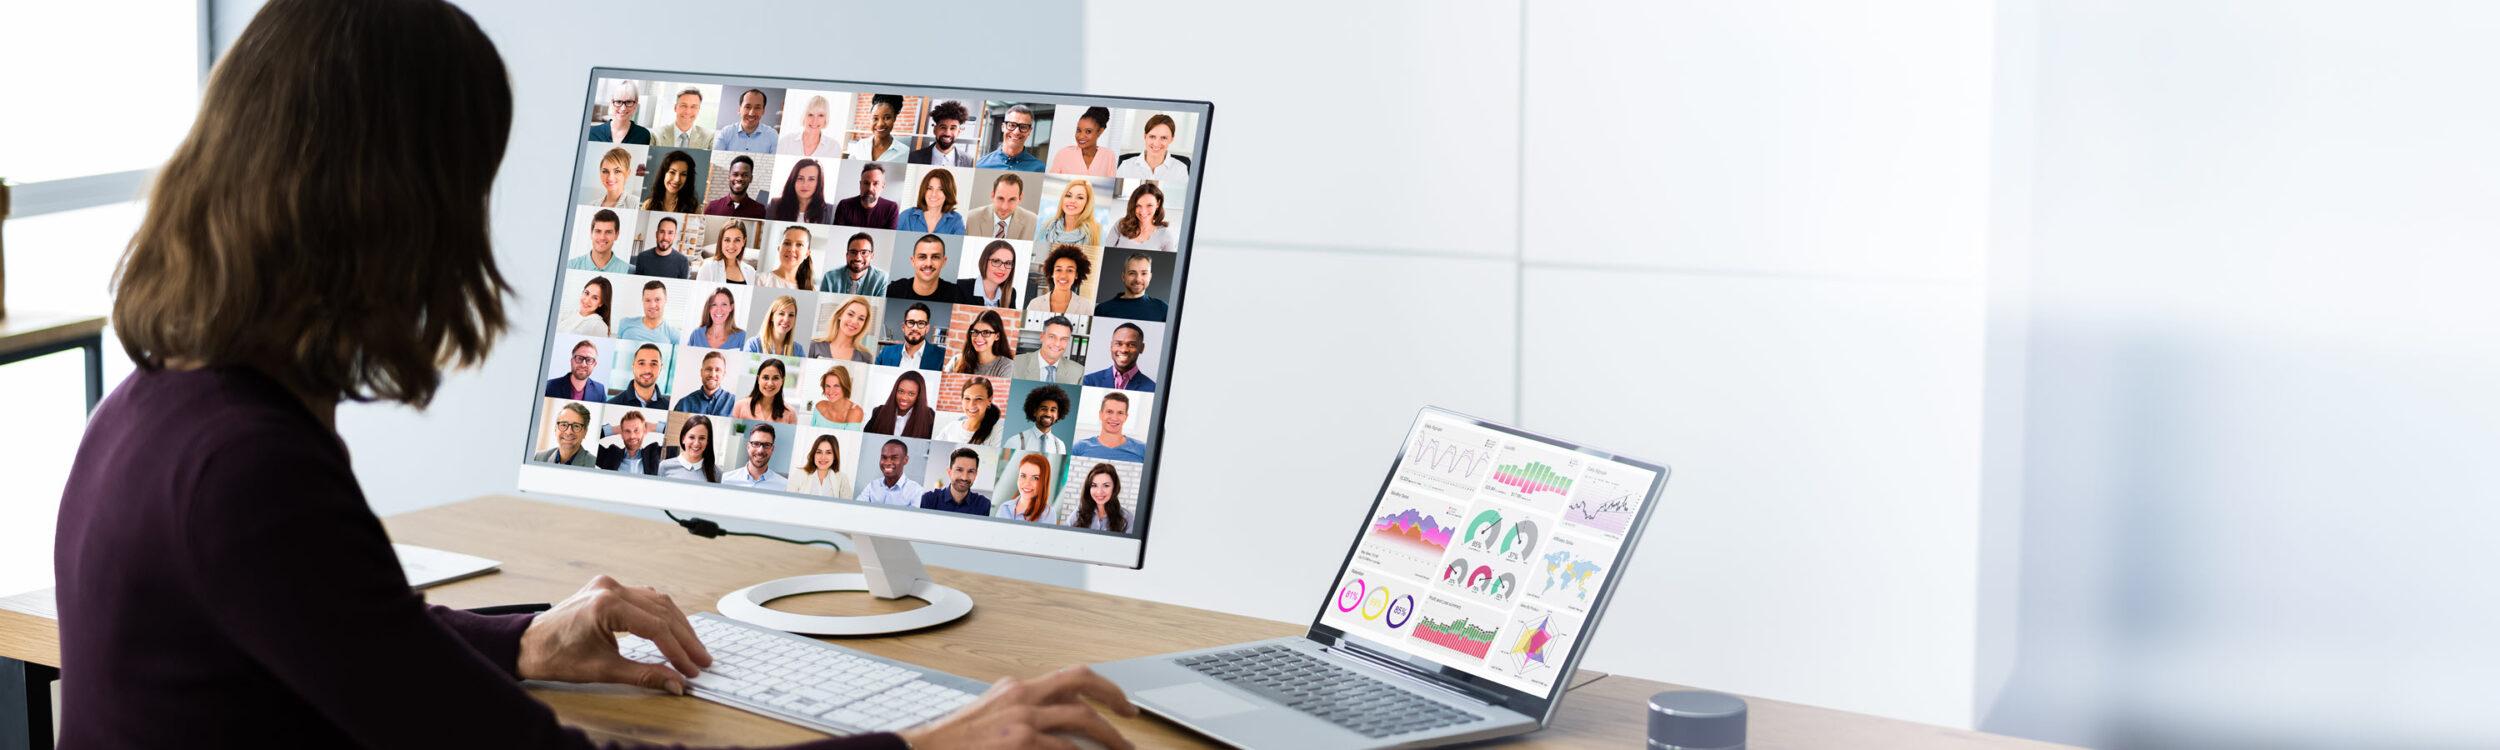 Enterprise Asset Management: Highlights from Mainstream 2021 featured image